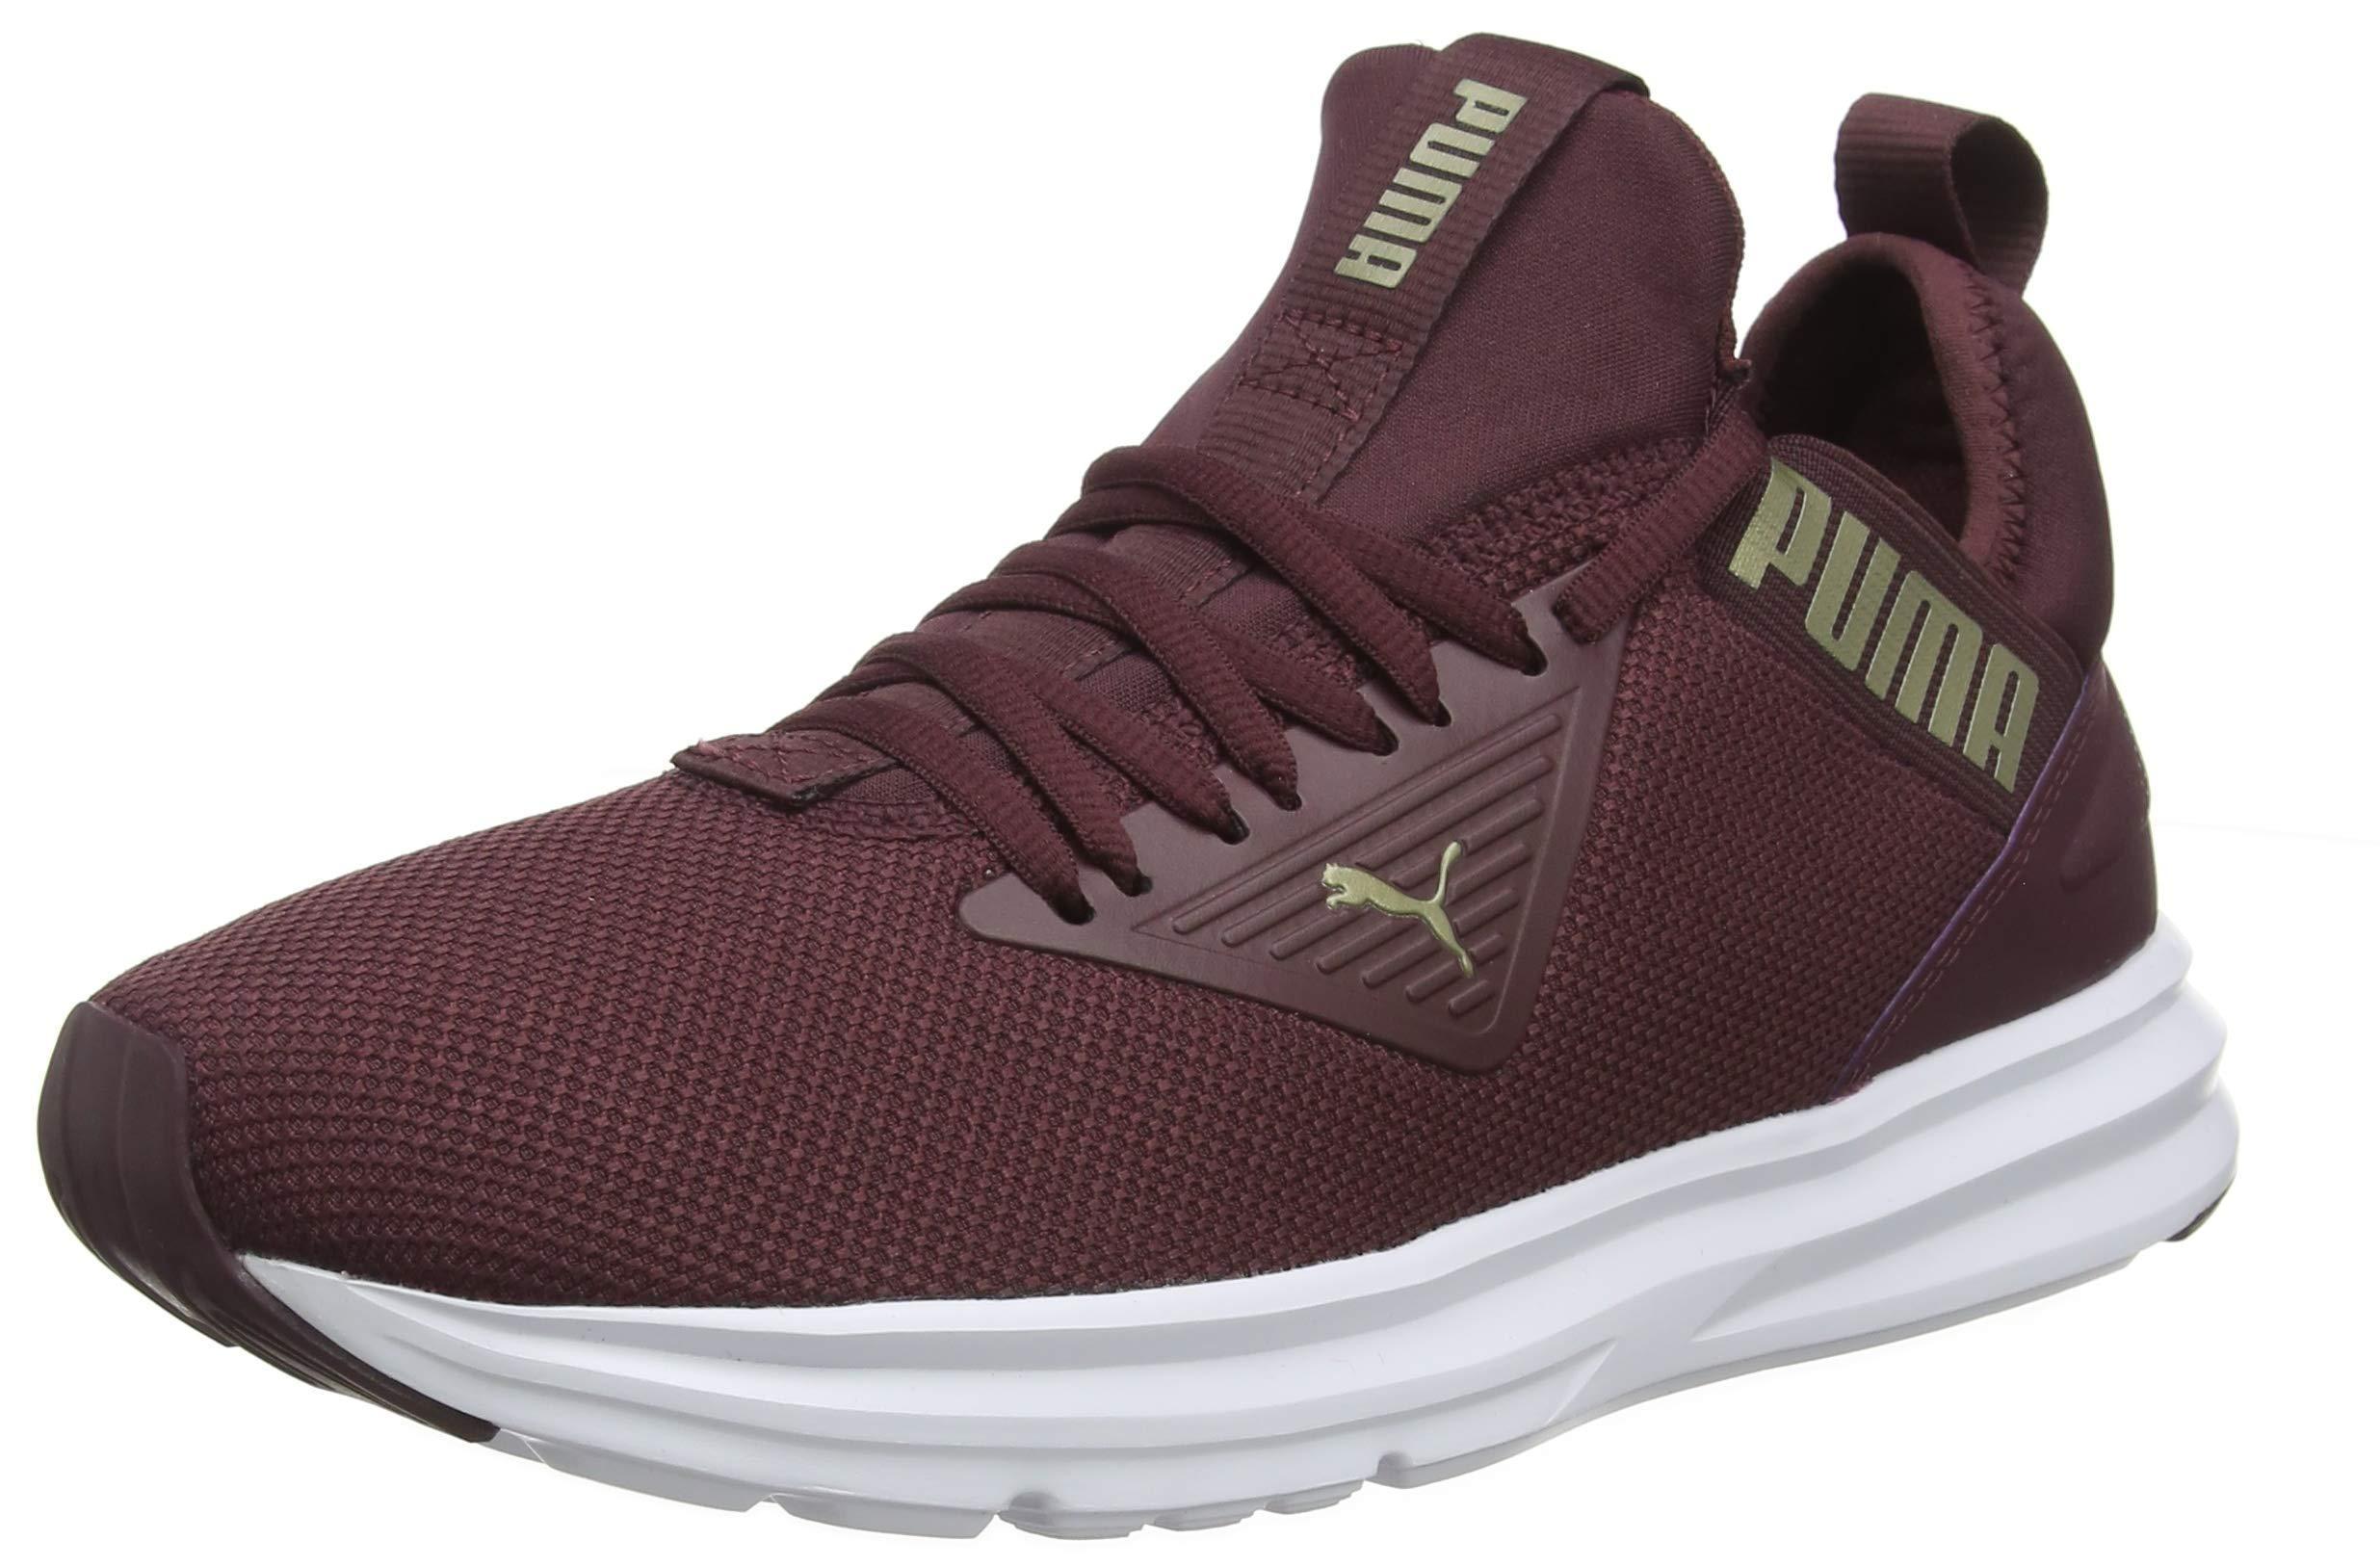 PUMA Enzo Beta Wn's Running Shoes